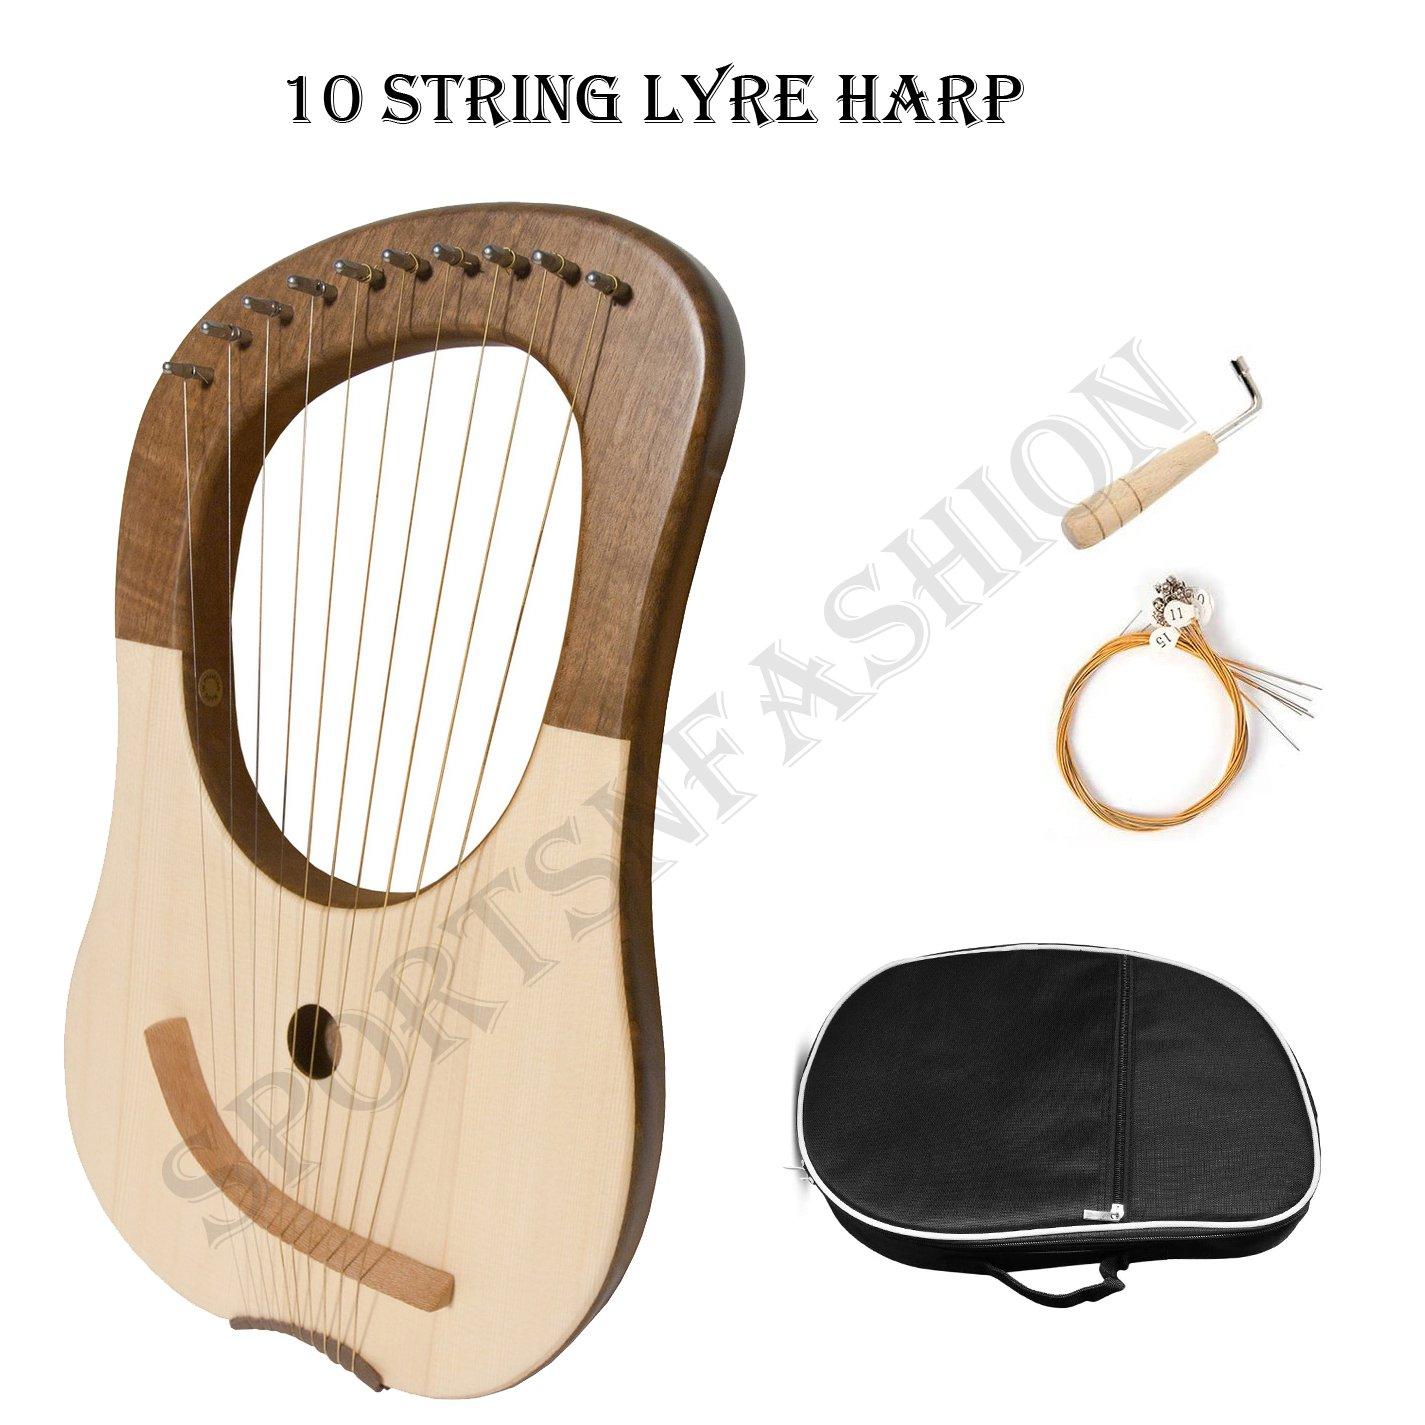 Lyre Harp 10 String - Walnut